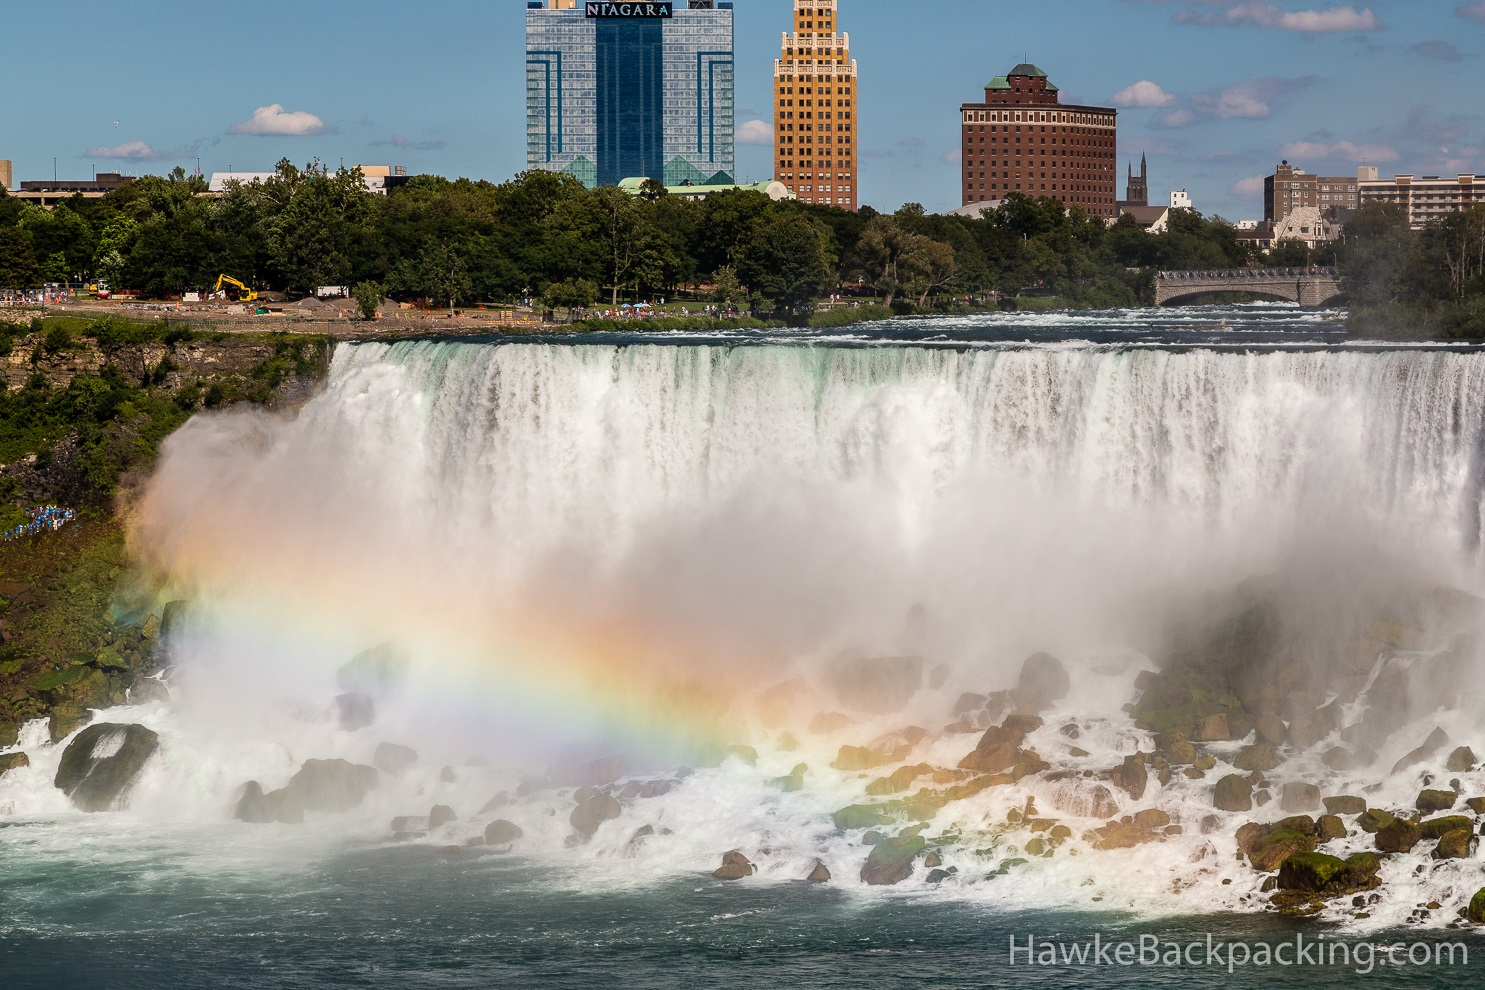 Niagara falls canada casinos casino movie on net